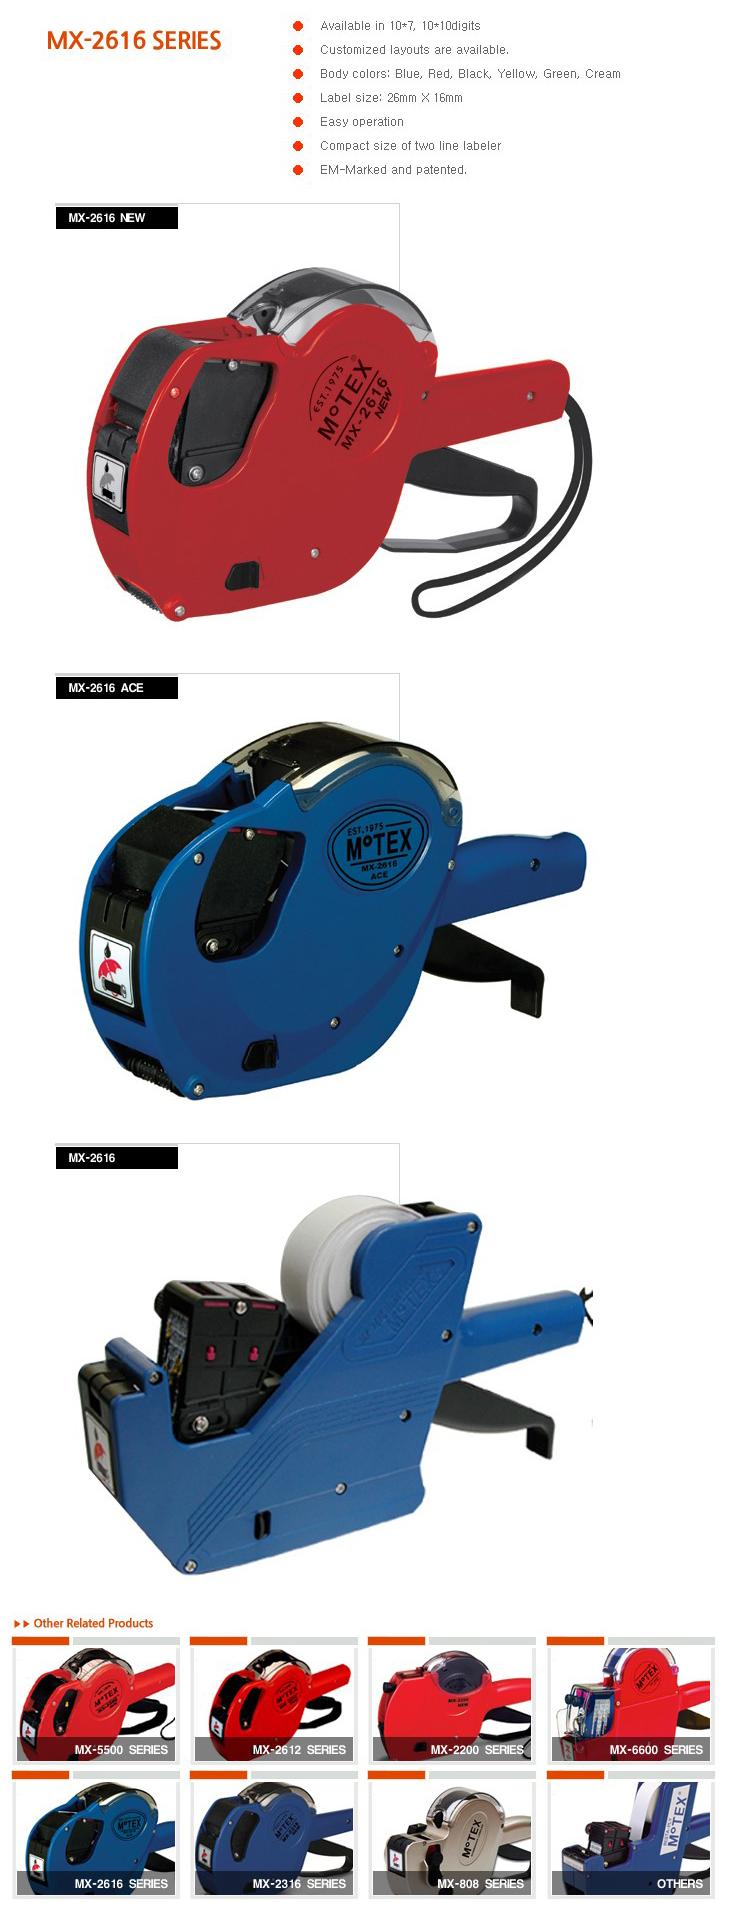 MOTEX Price Labeler (2-Line Label Guns) MX-2616 Series